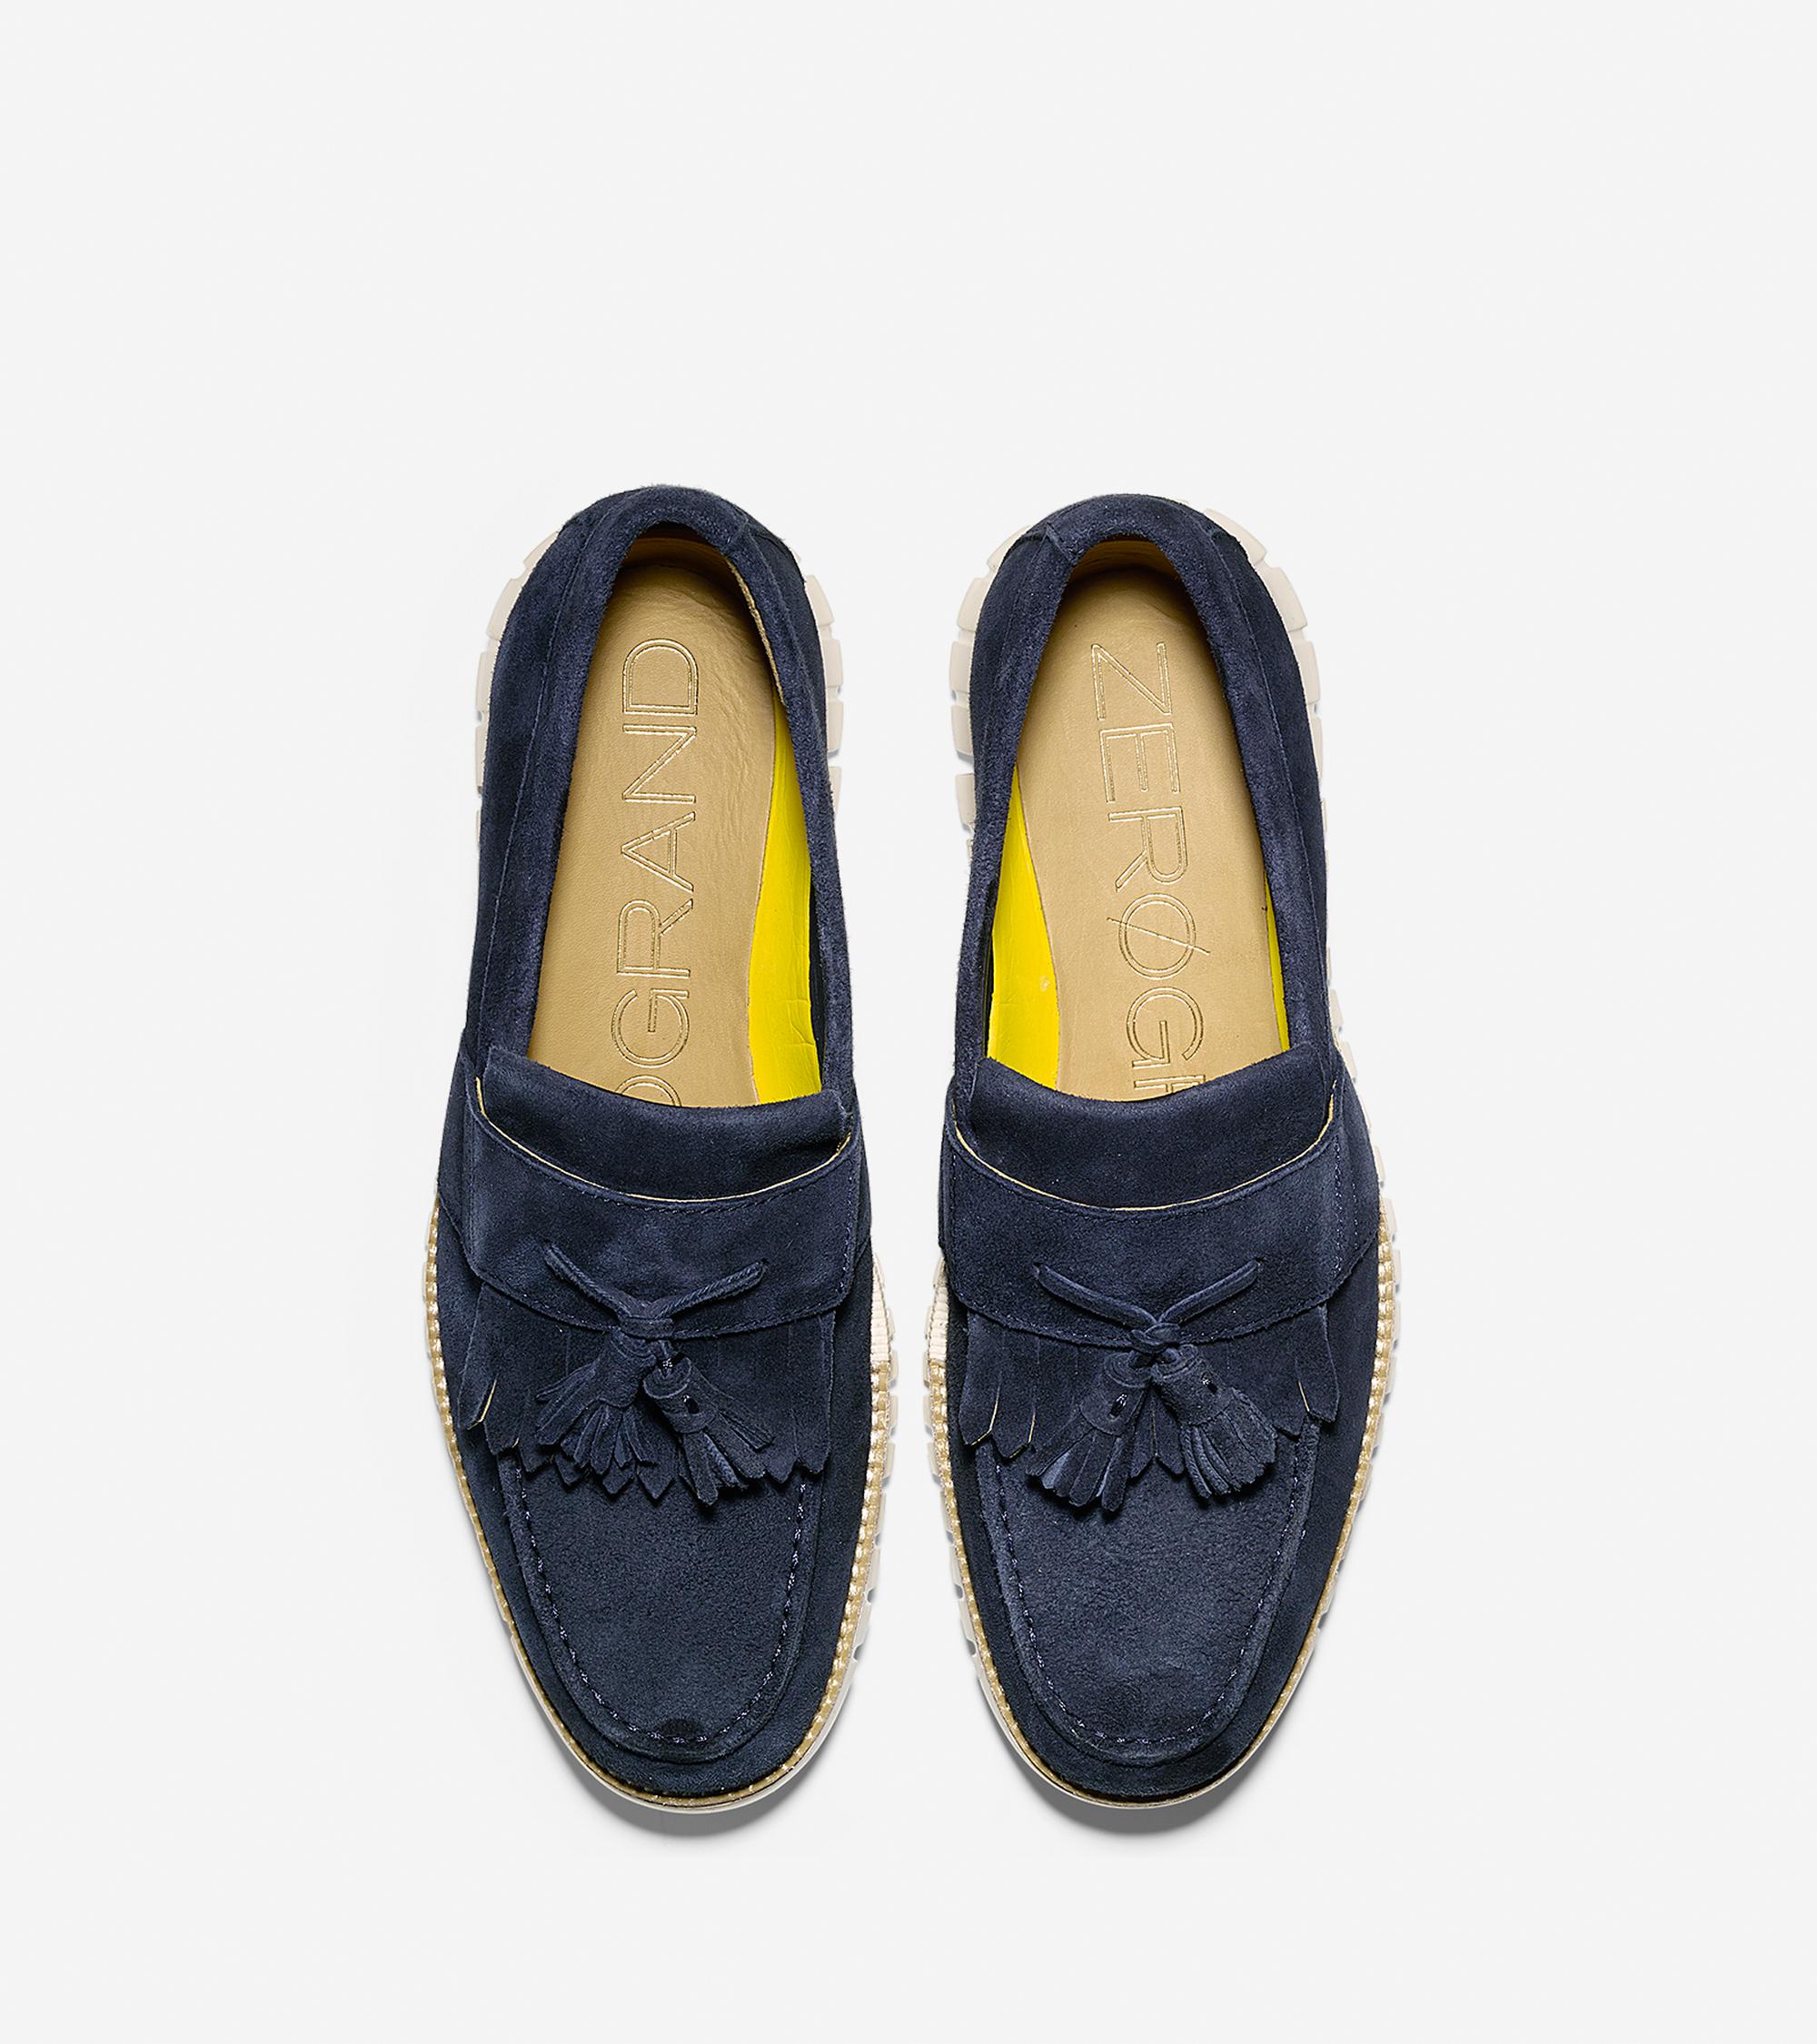 Cole Haan Shoes Buy Online India